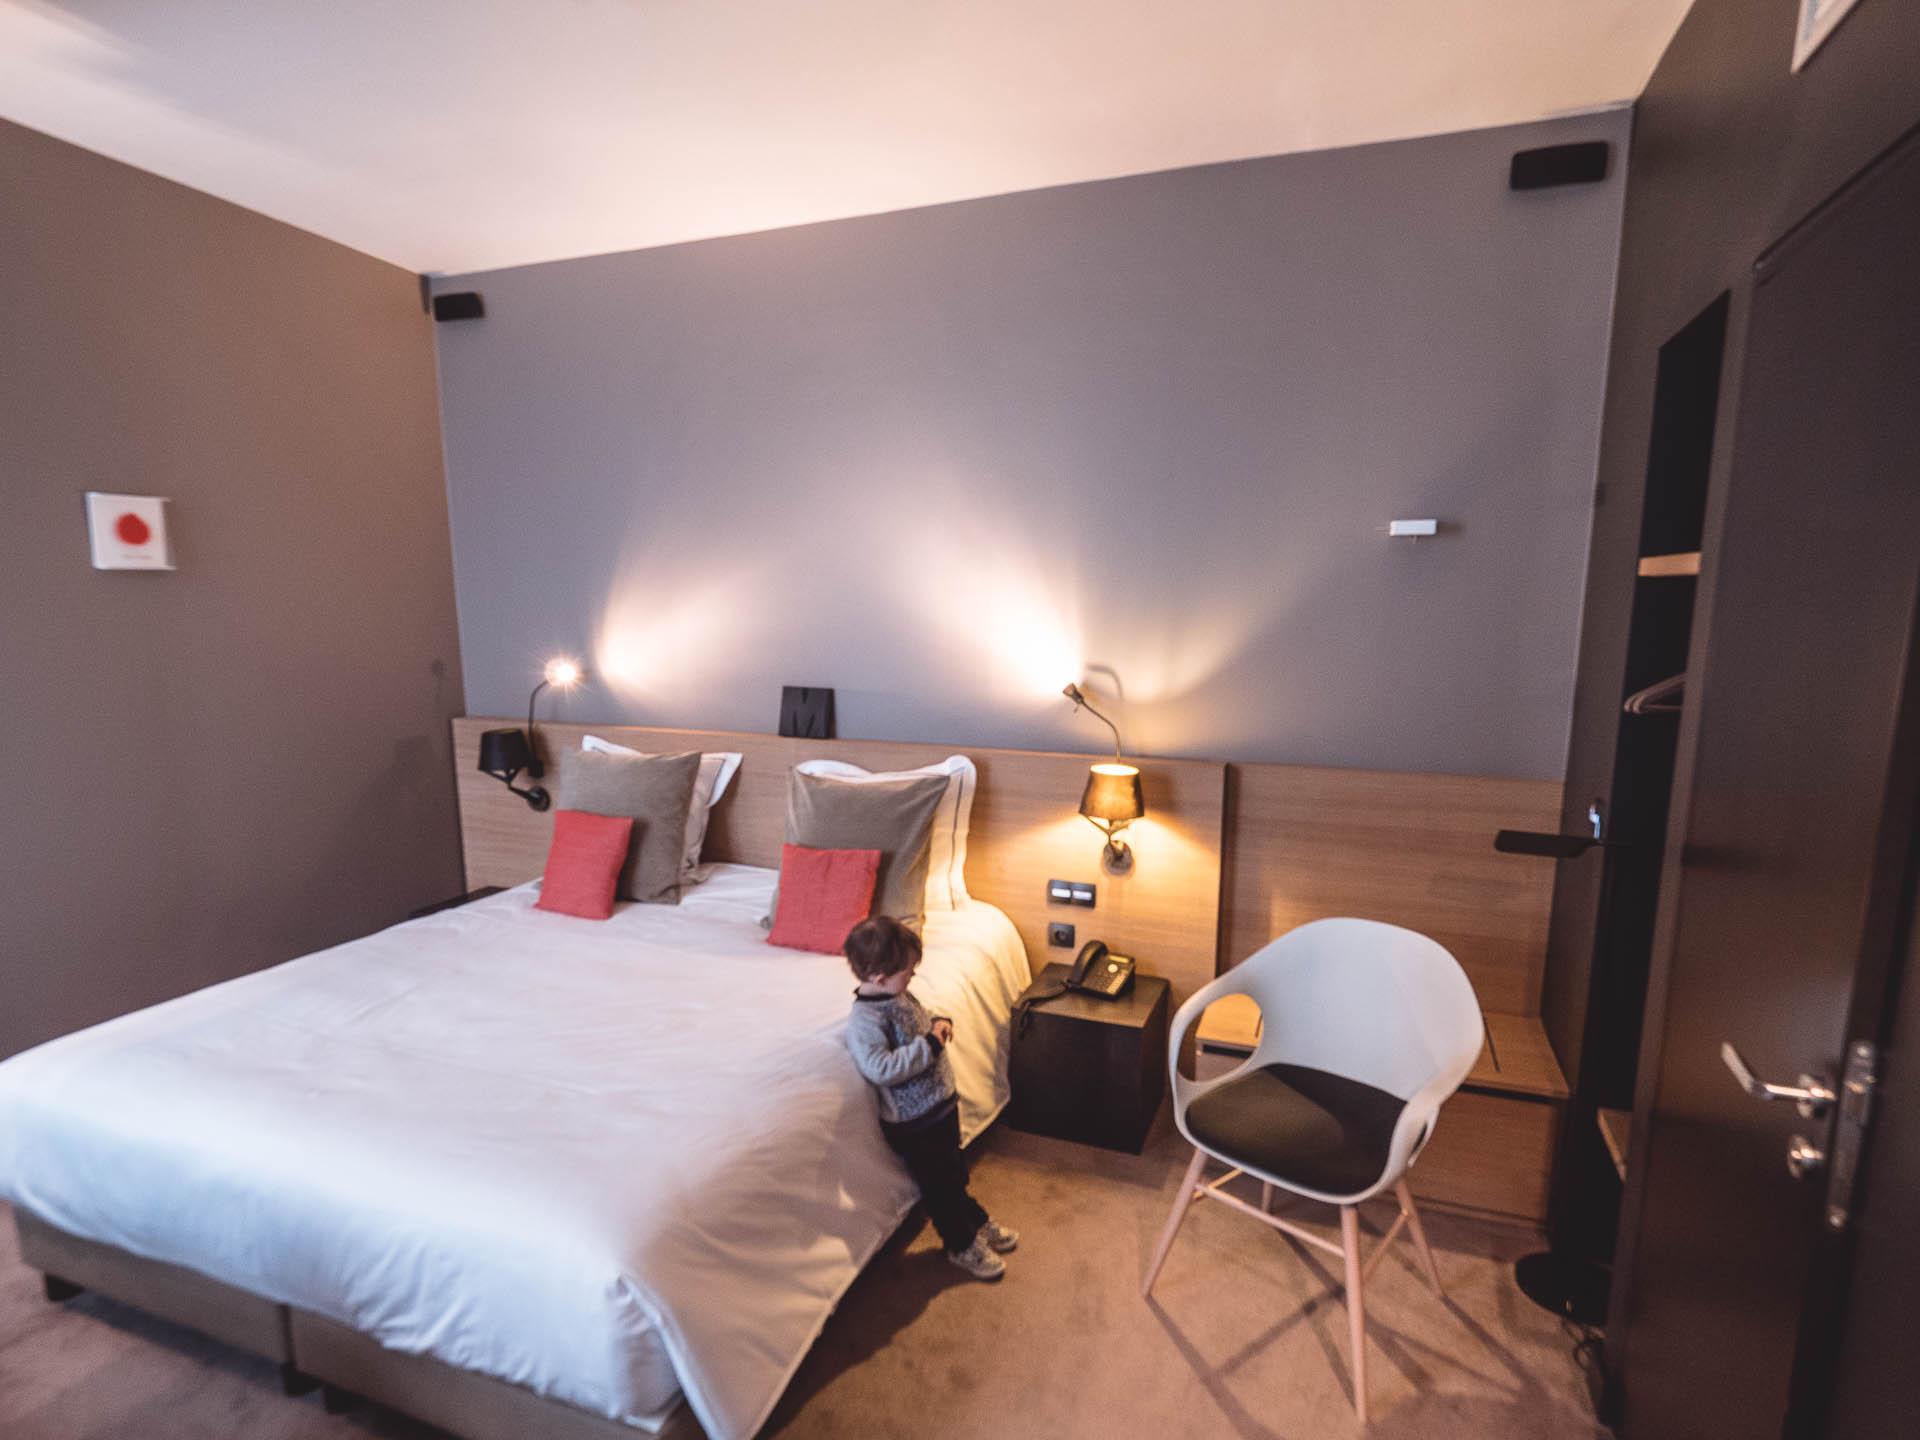 Liège hôtel neuvice chambre